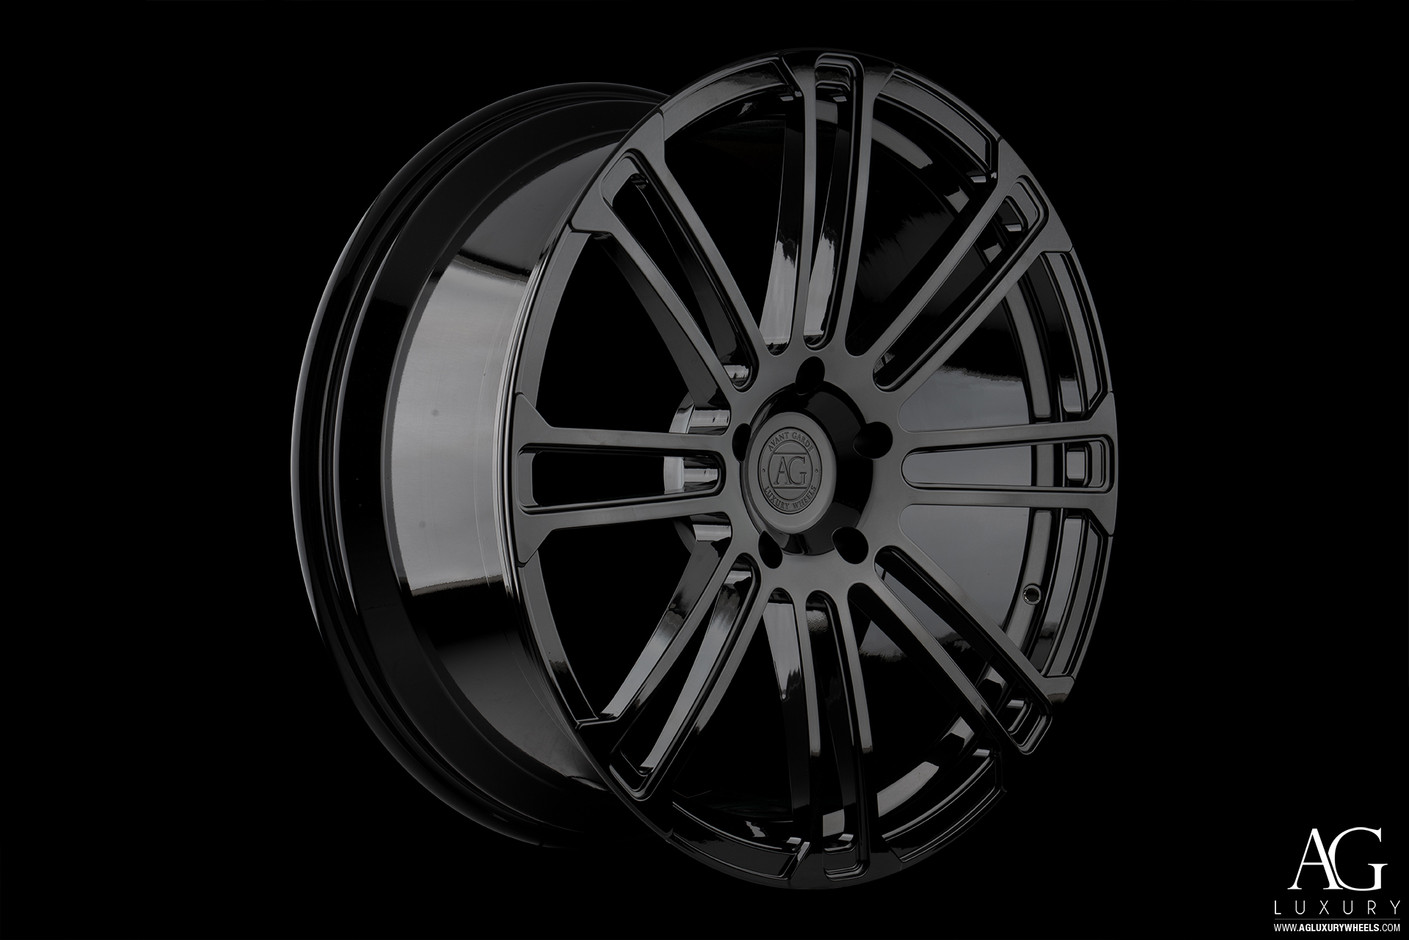 agl14-agluxury-wheels-gloss-black-11.jpg